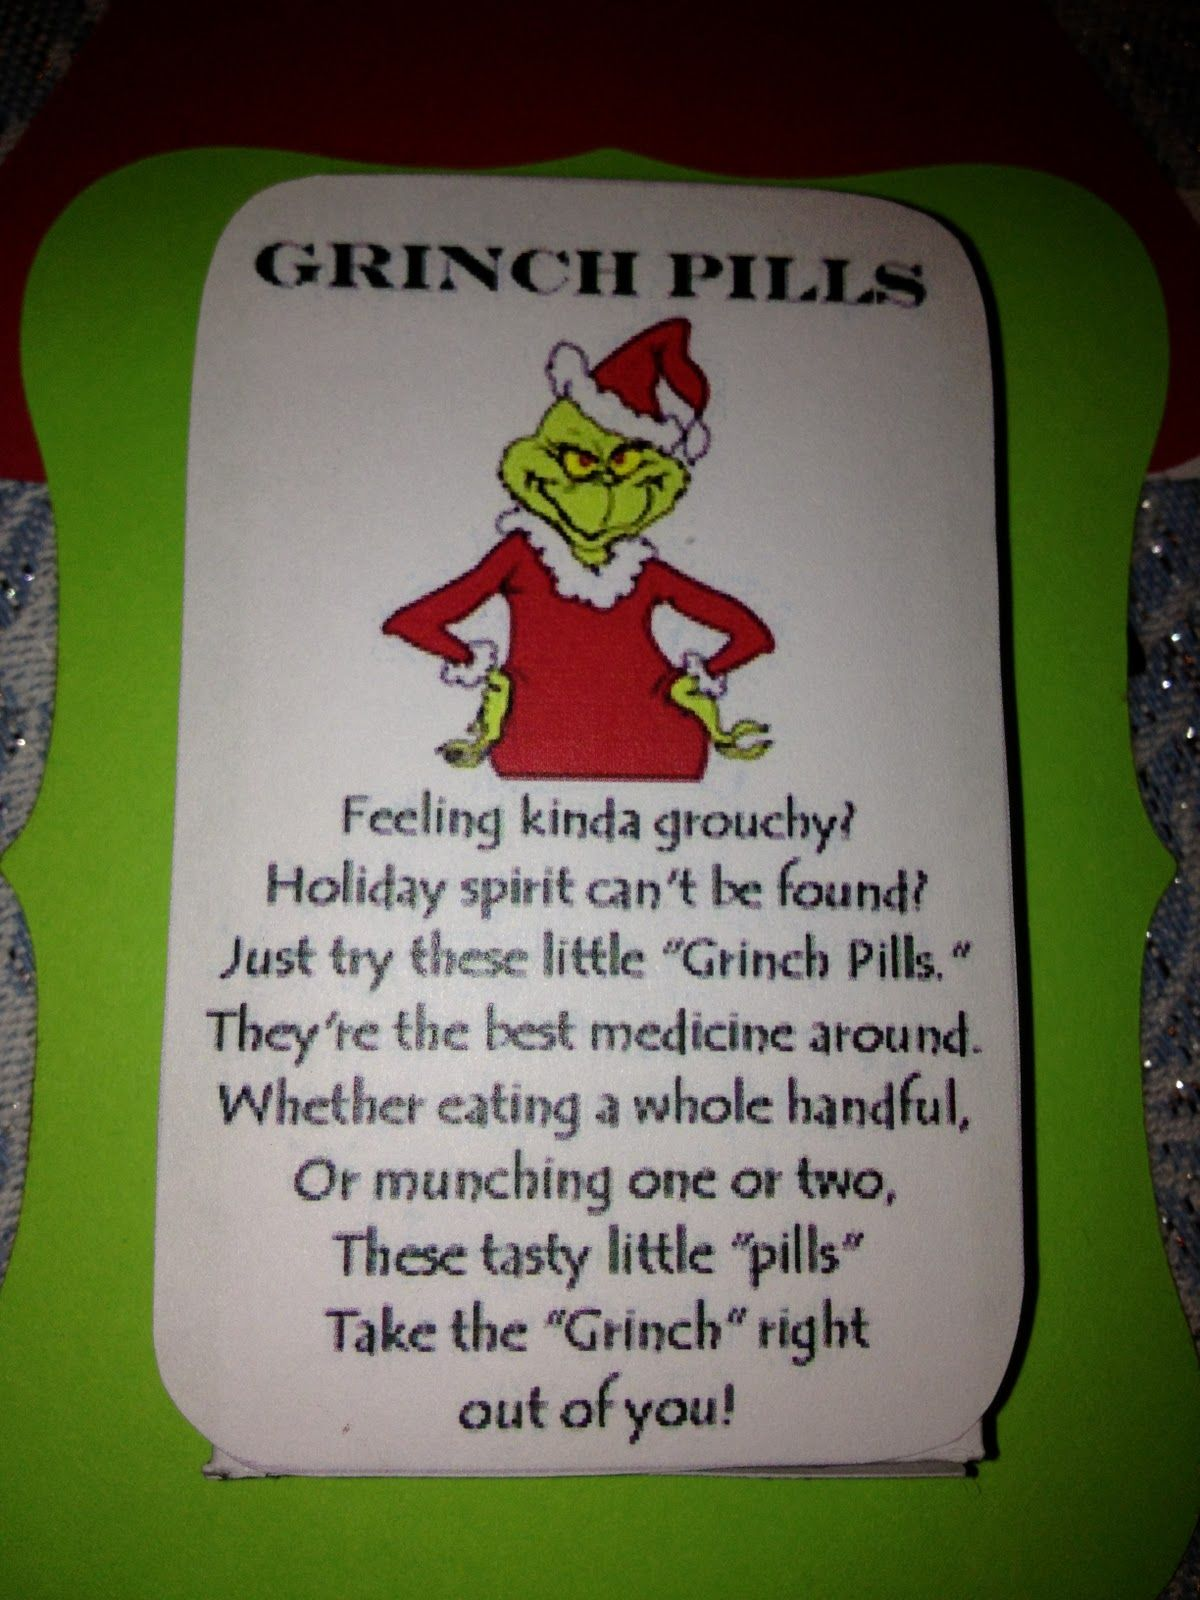 Grinch pills!   :::Splitting hairs:::   Pinterest